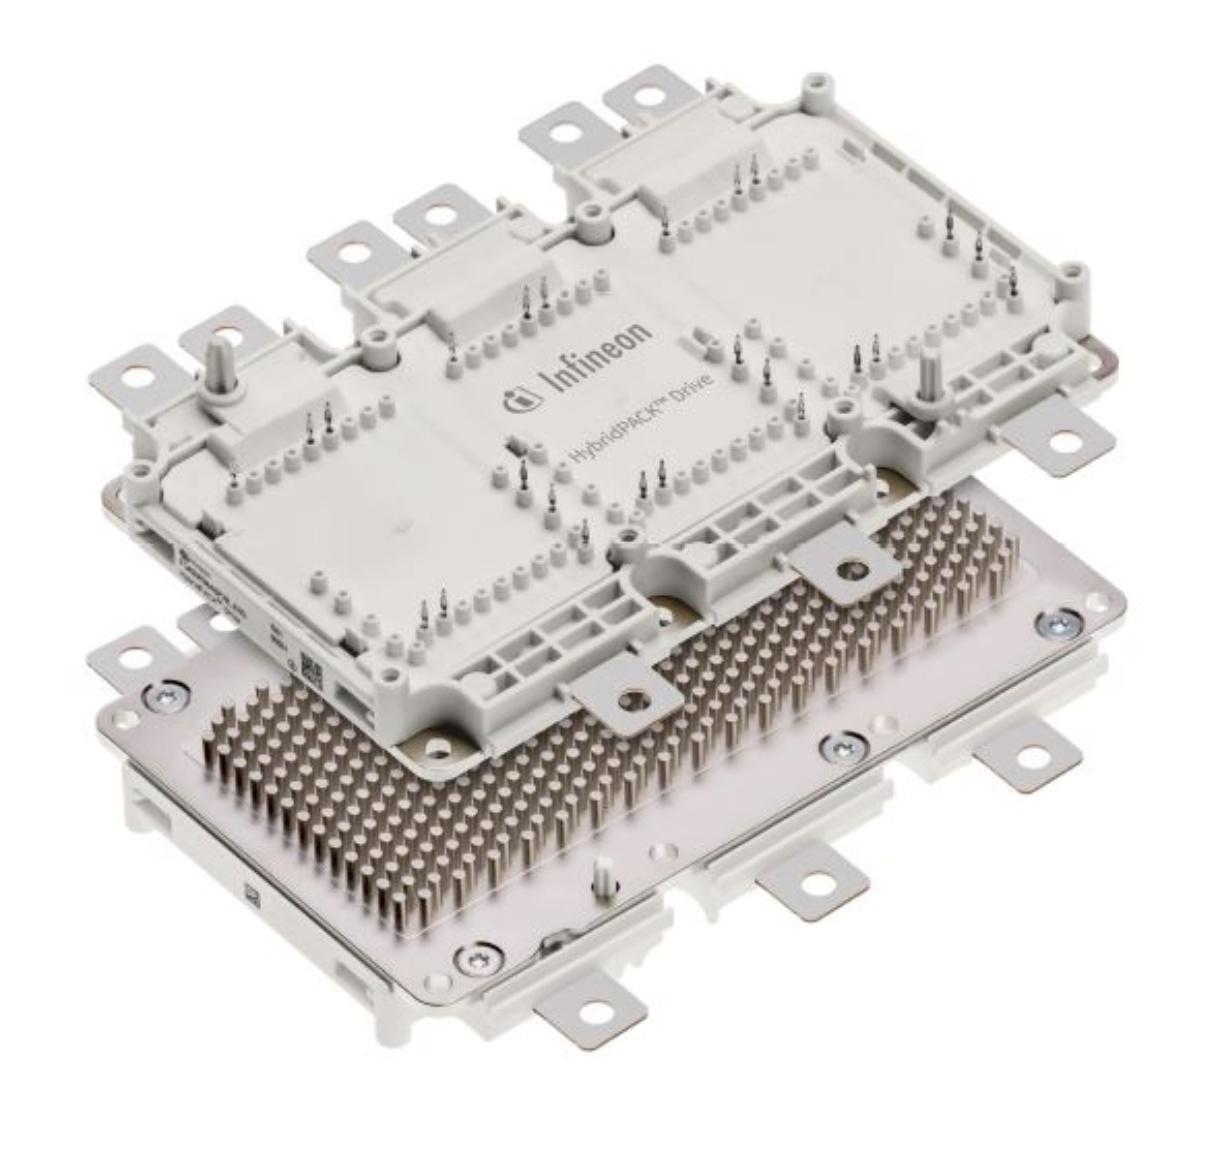 FS950R08A6P2B | 750 V, 950 A sixpack automotive qualified IGBT module -  Infineon Technologies